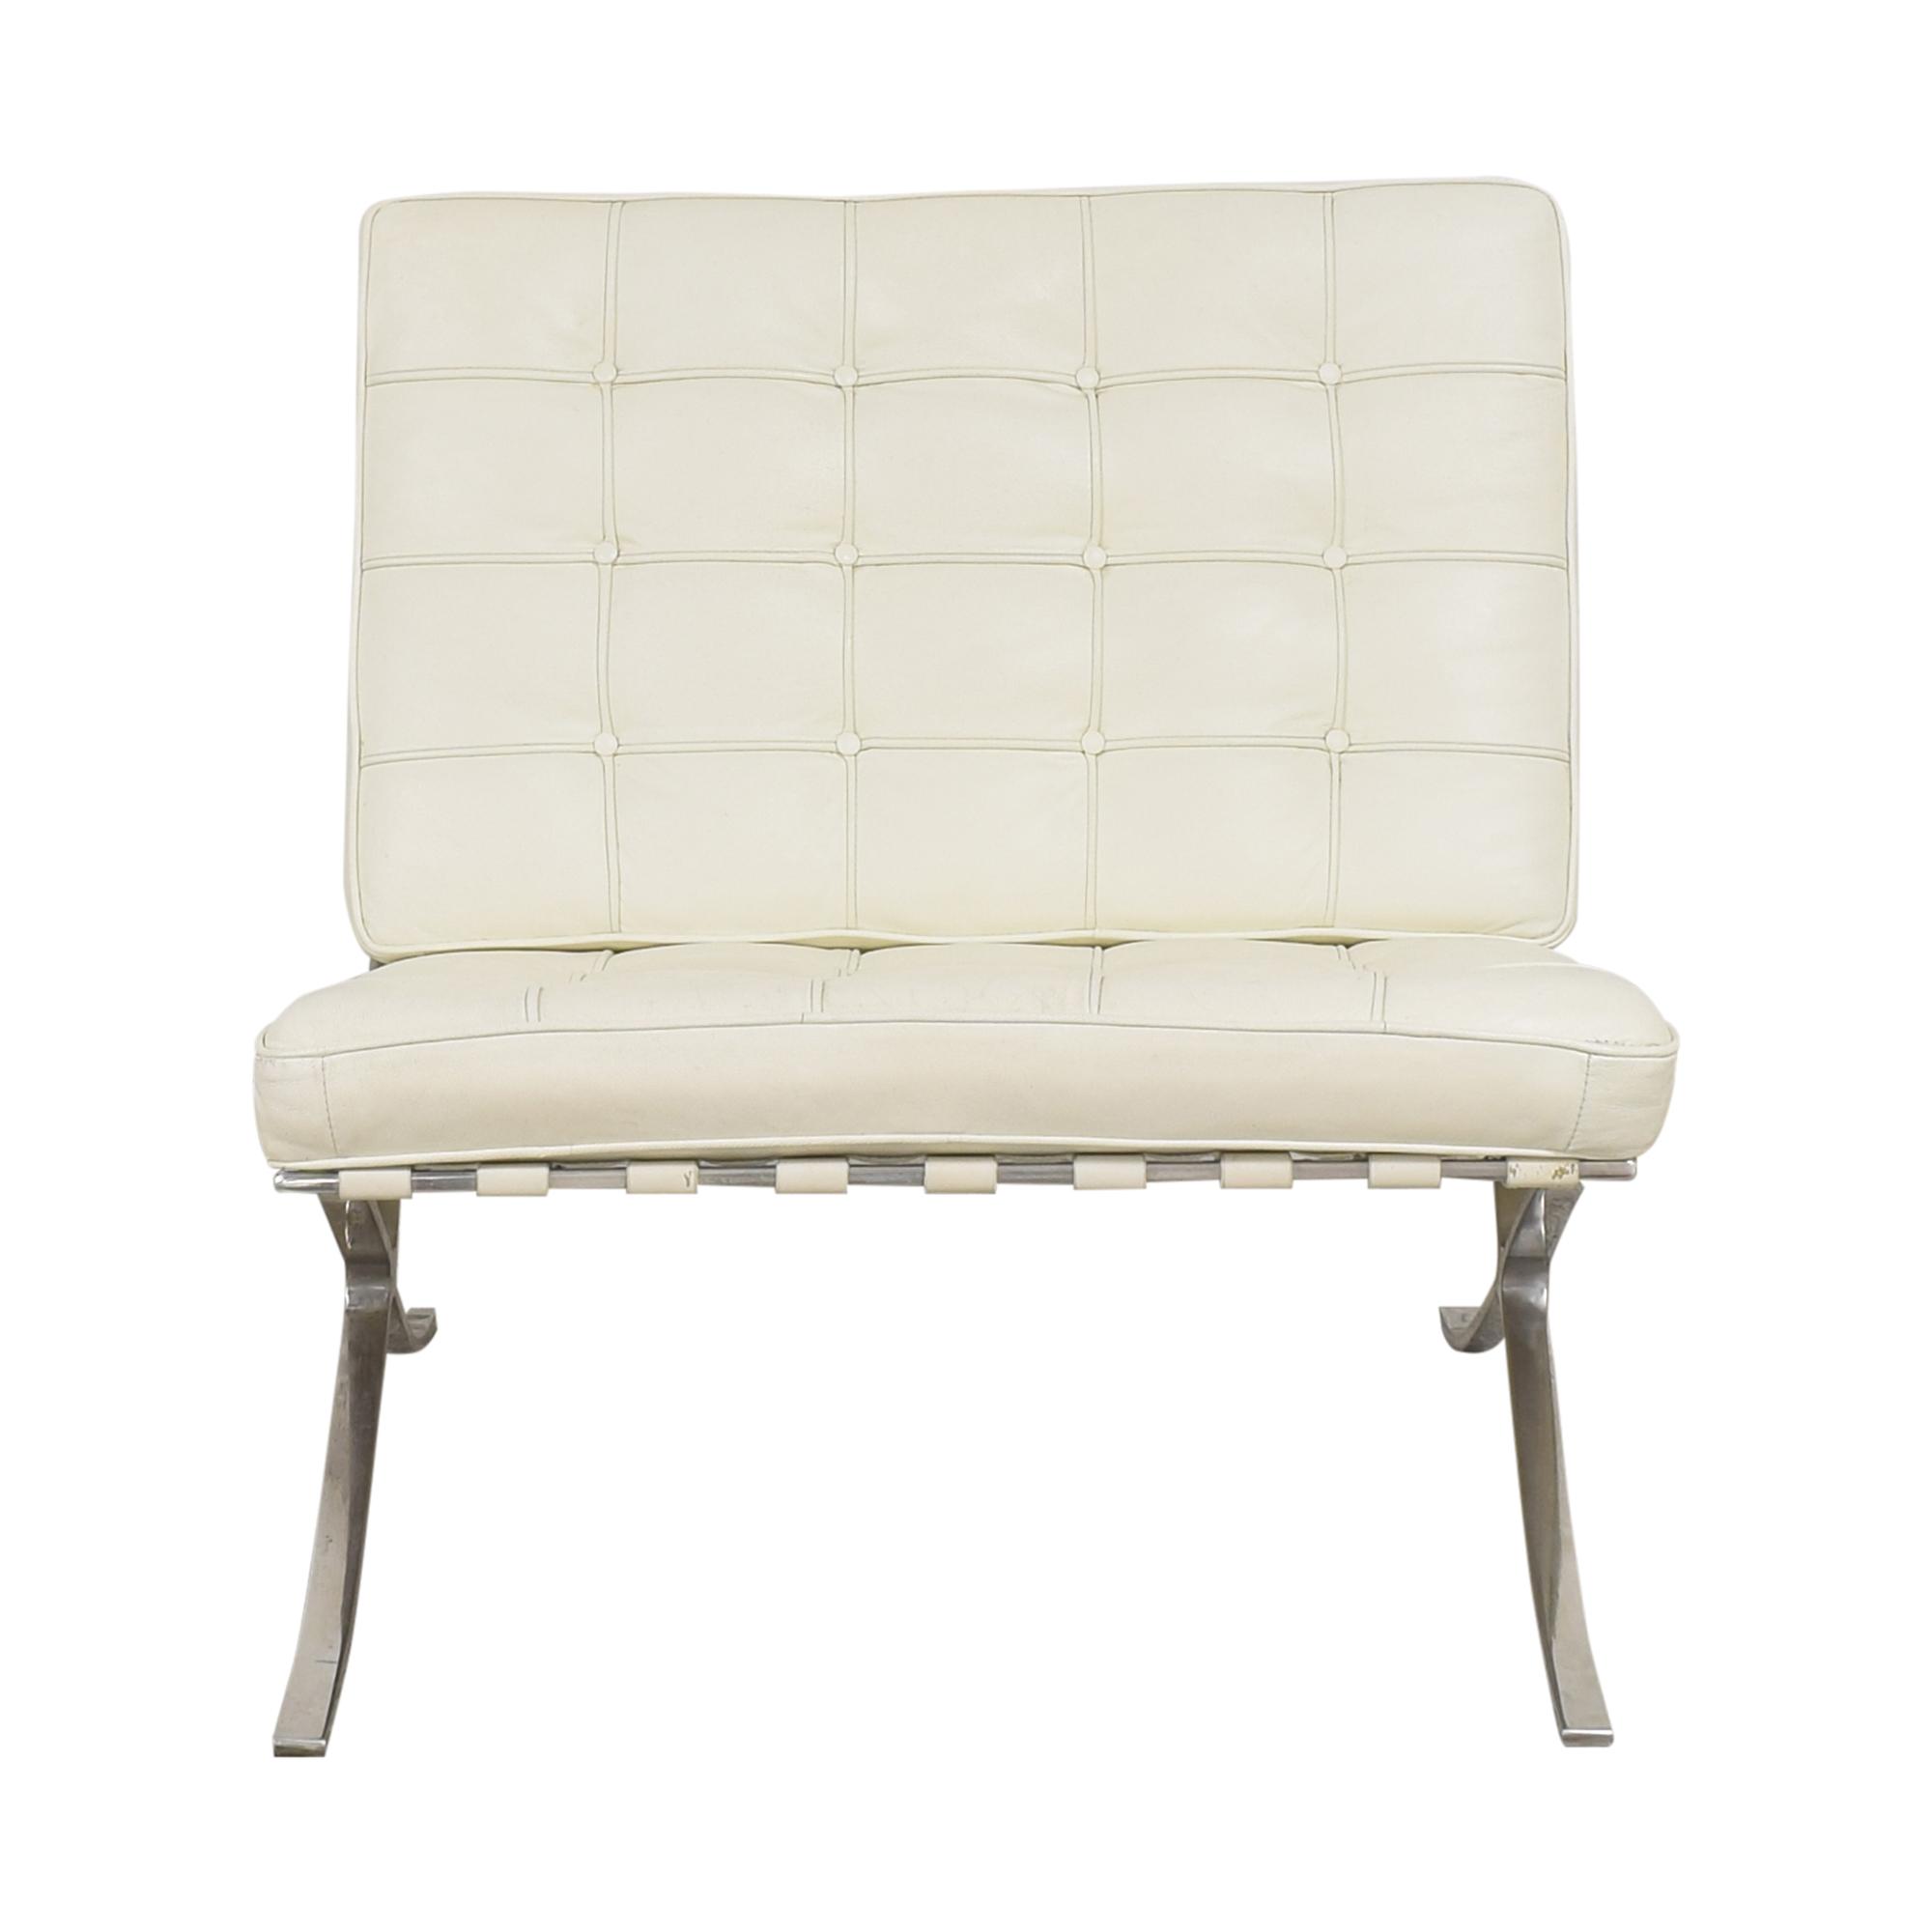 Modern Classics Barcelona Chair Replica / Chairs